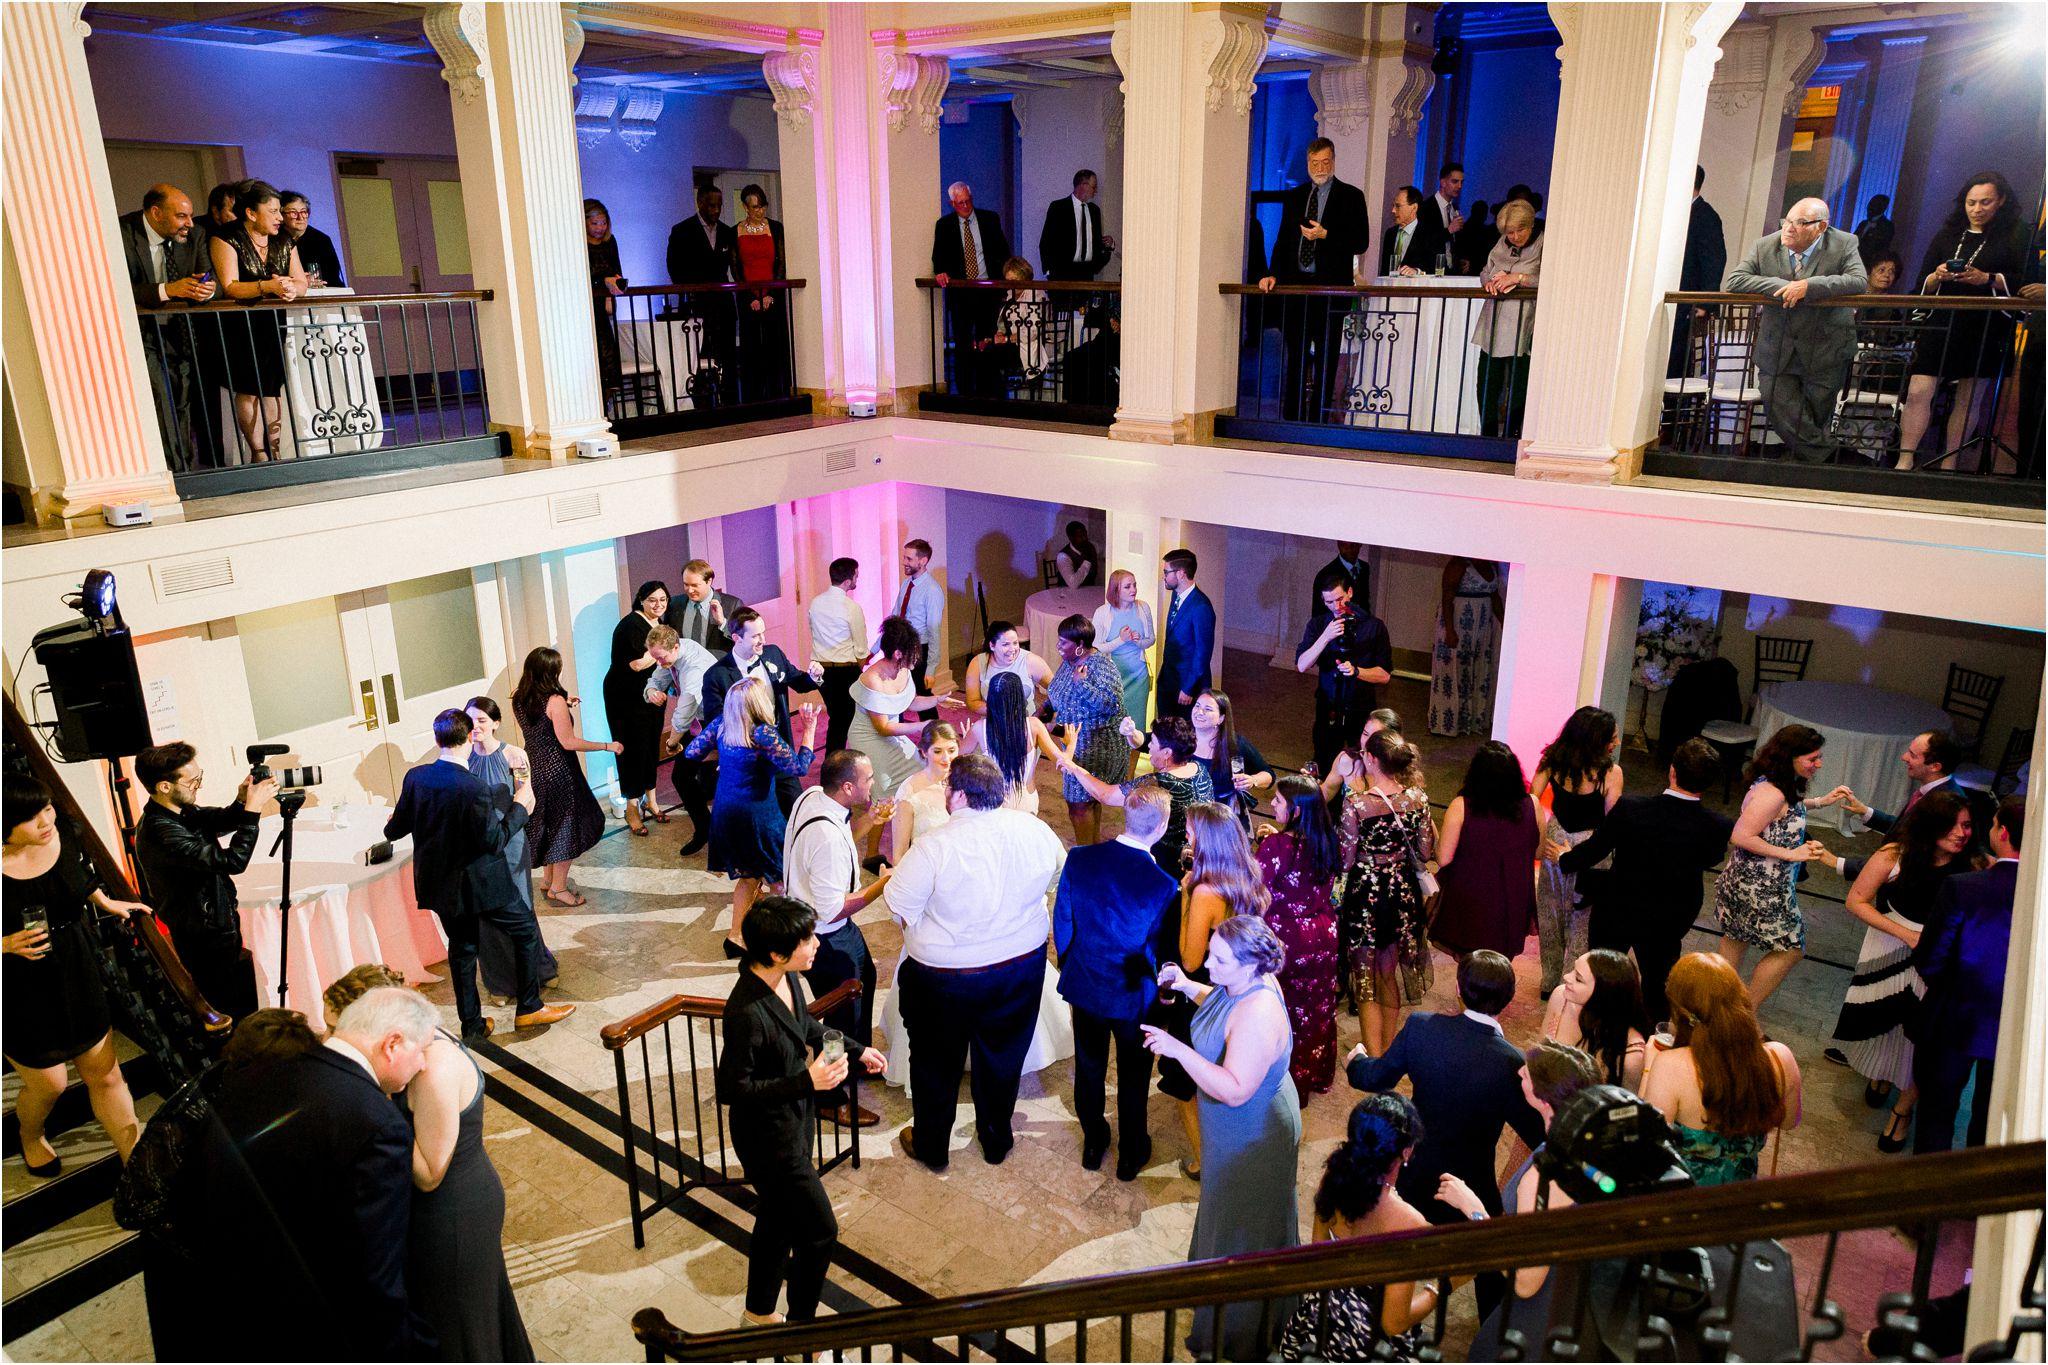 providence-public-library-wedding-images_00053.JPG